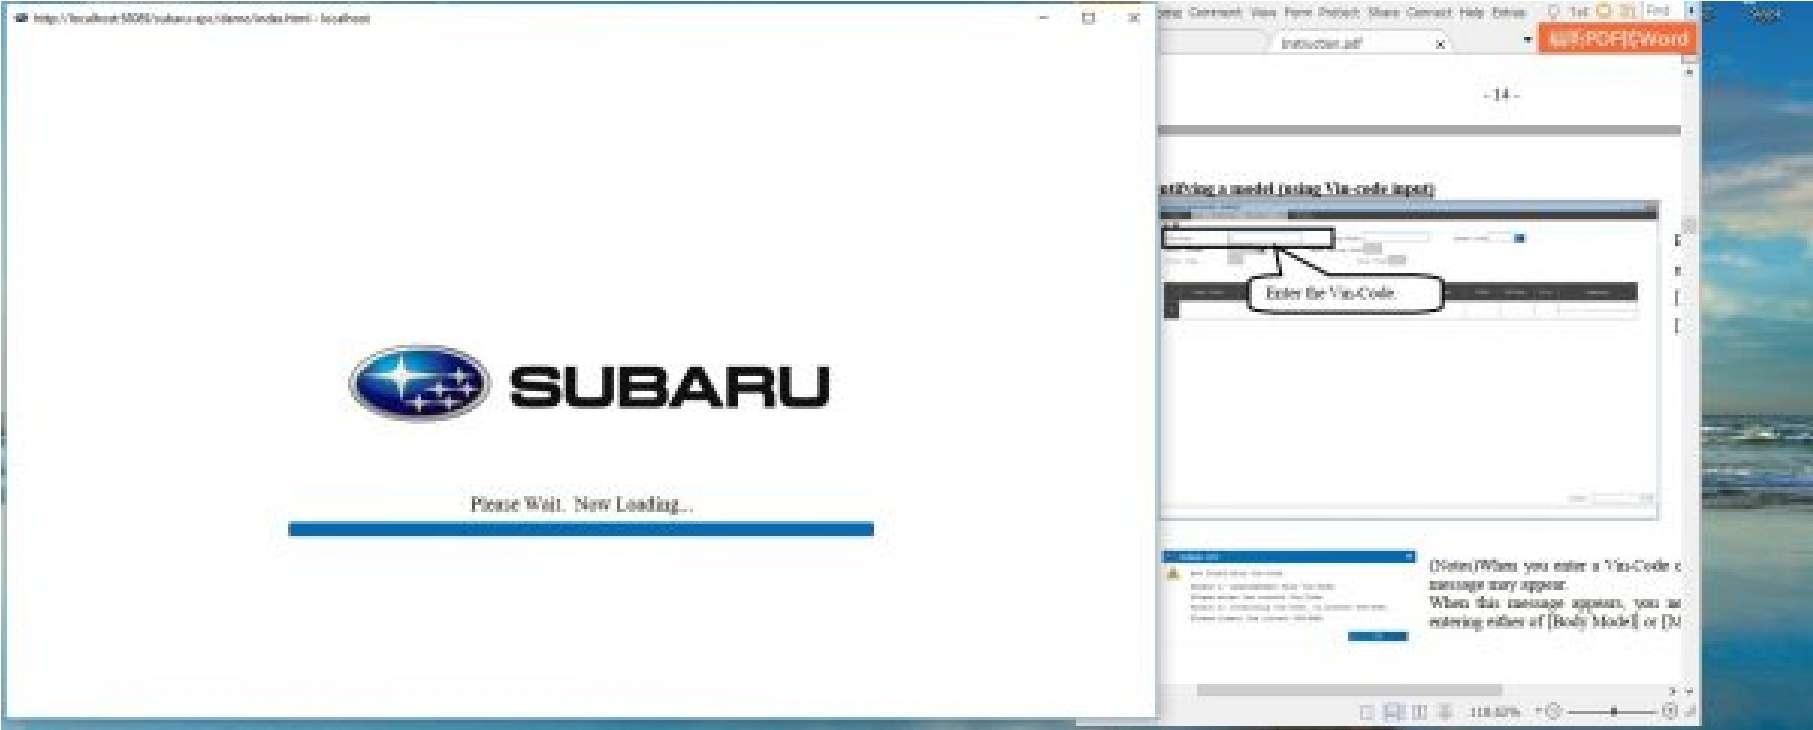 Subaru Fast 3 EPC Europe General or USA 11.2020 ss-01